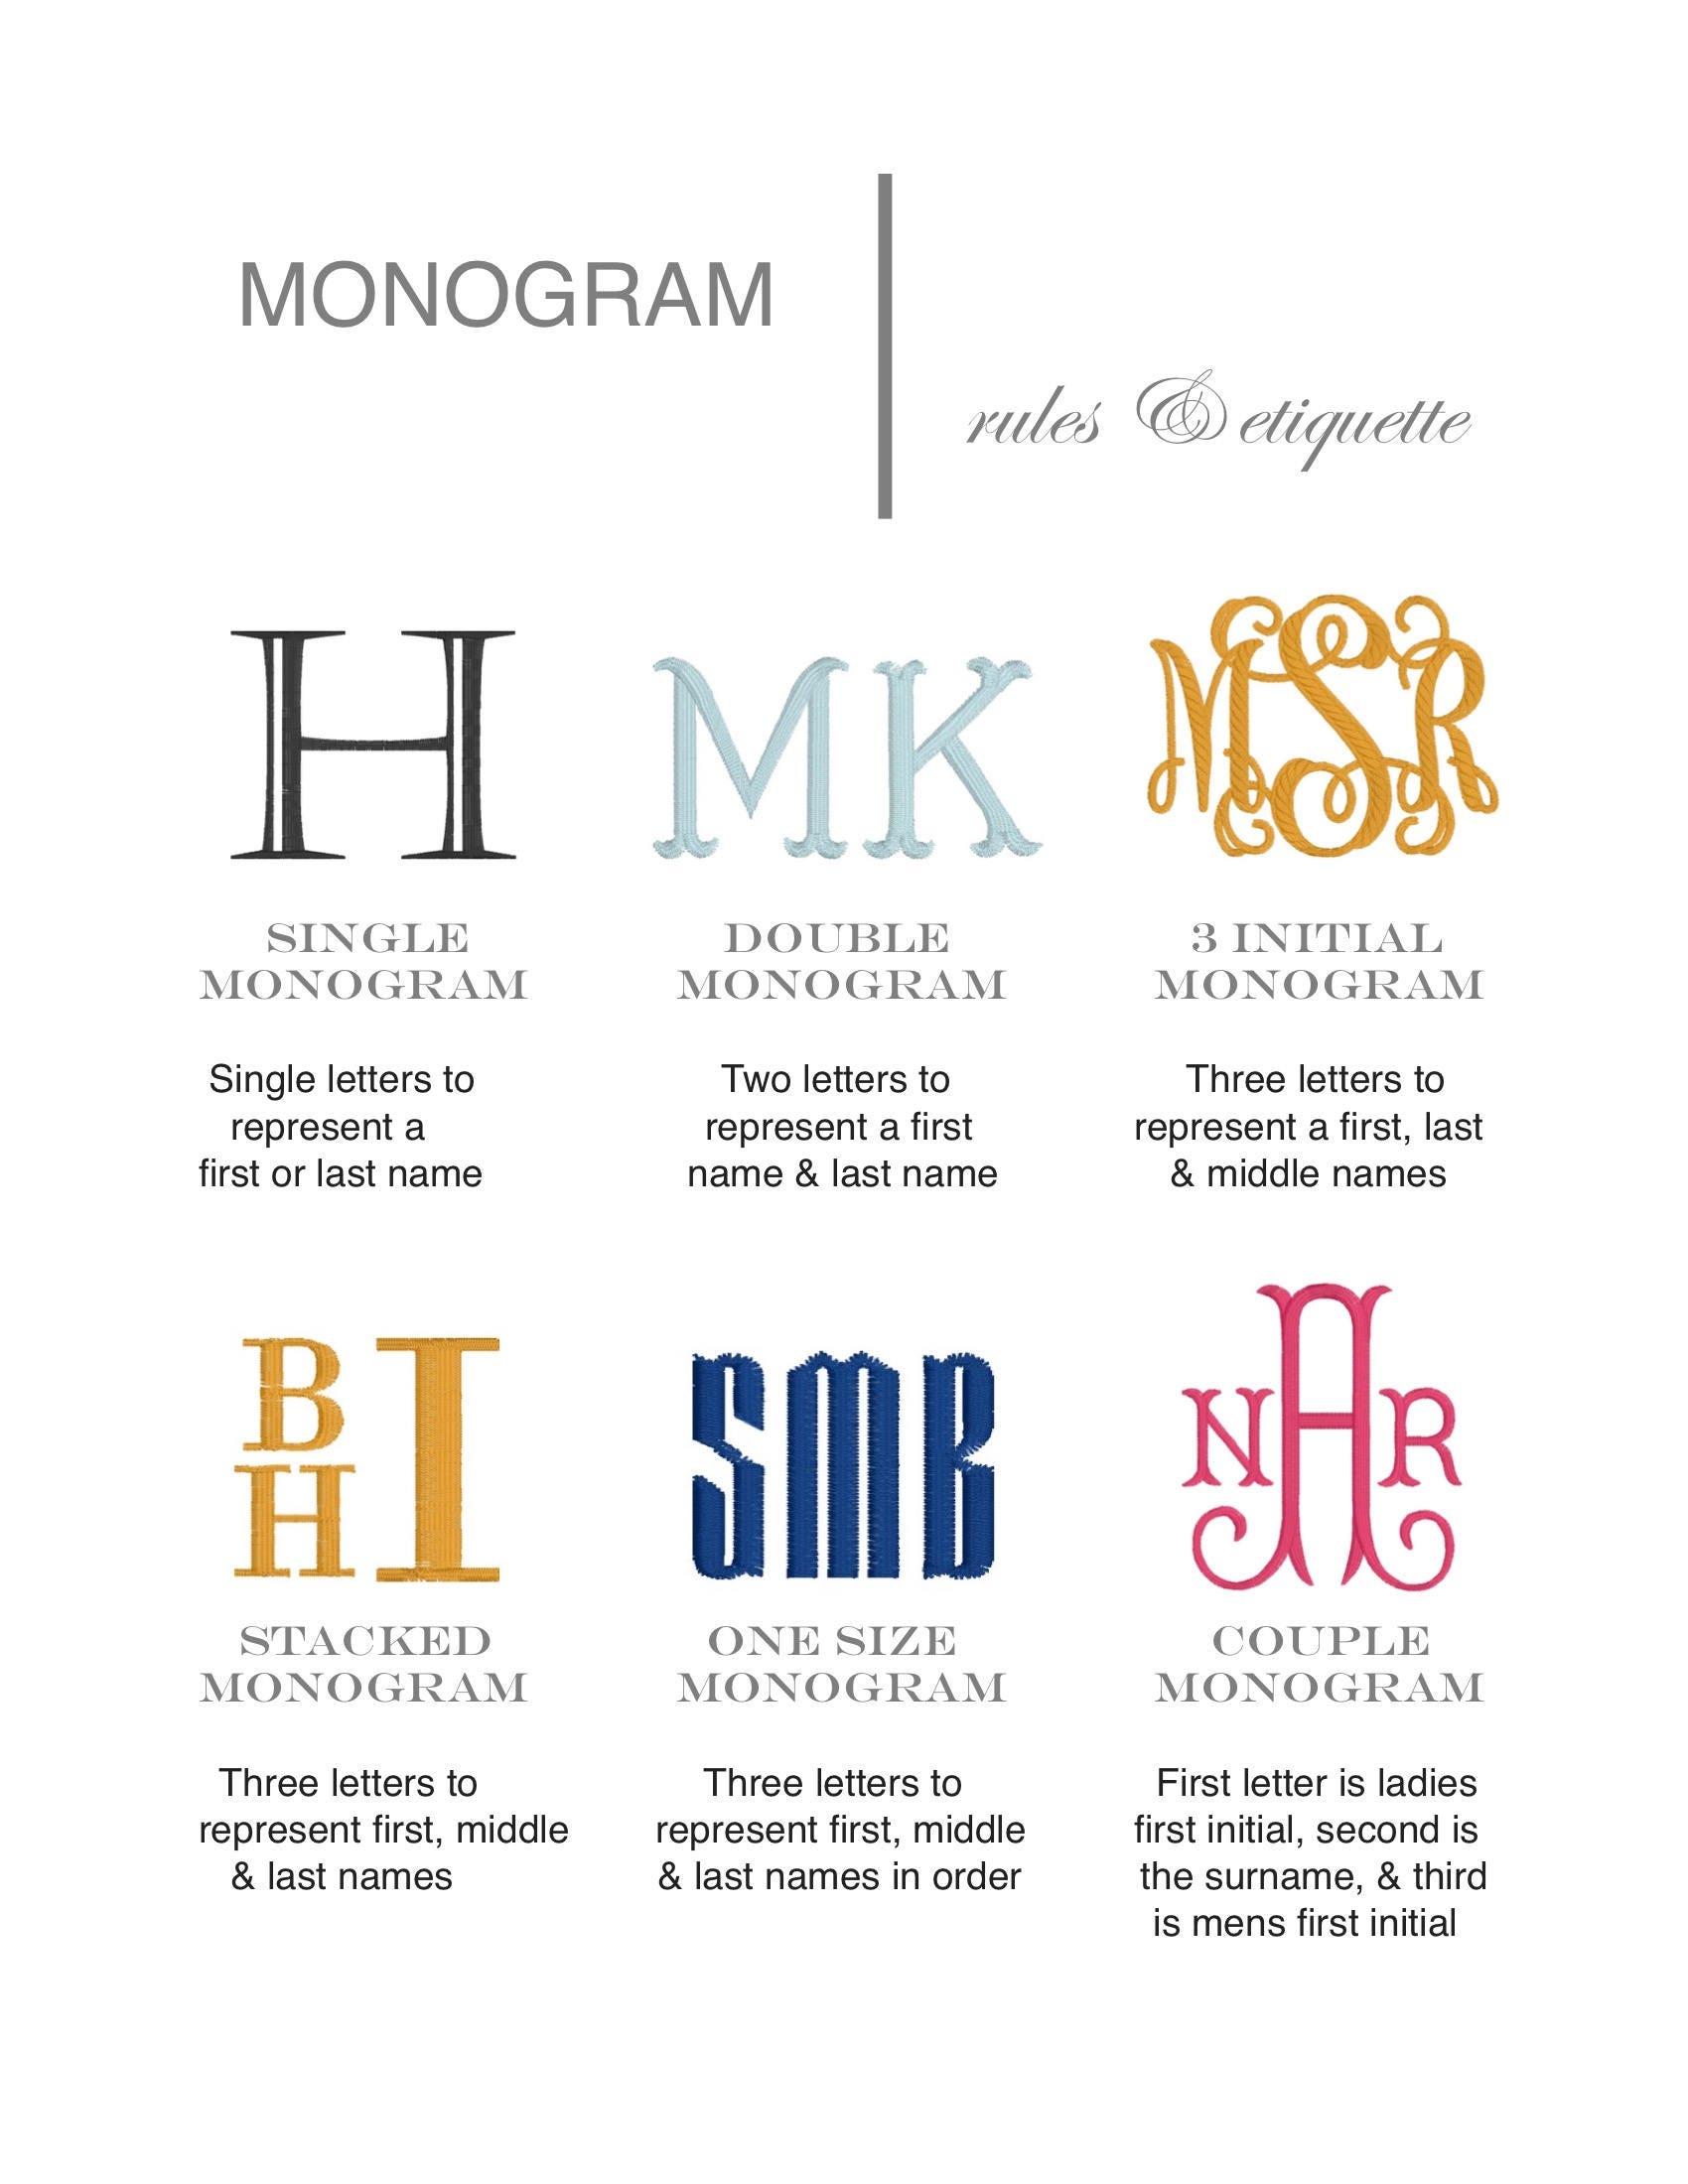 Wedding Monogrammed Handkerchief Personalized Bridal